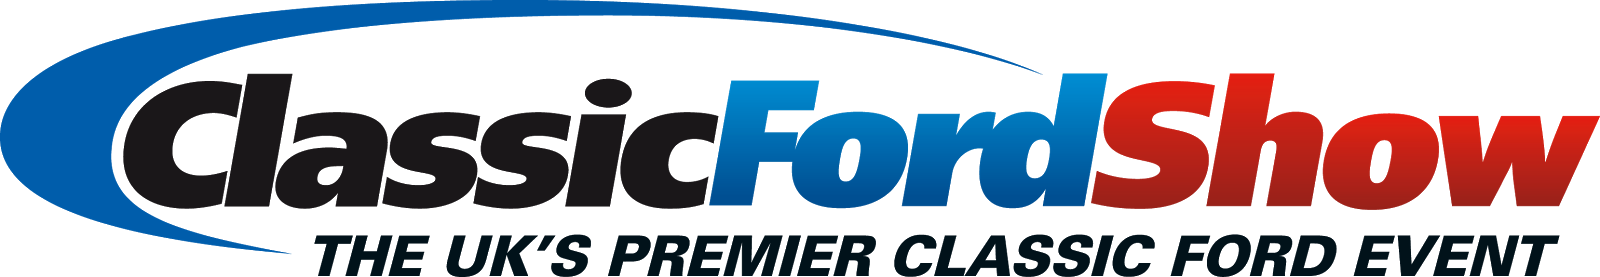 Classic Ford Show 2015 (Santa Pod RaceWay)